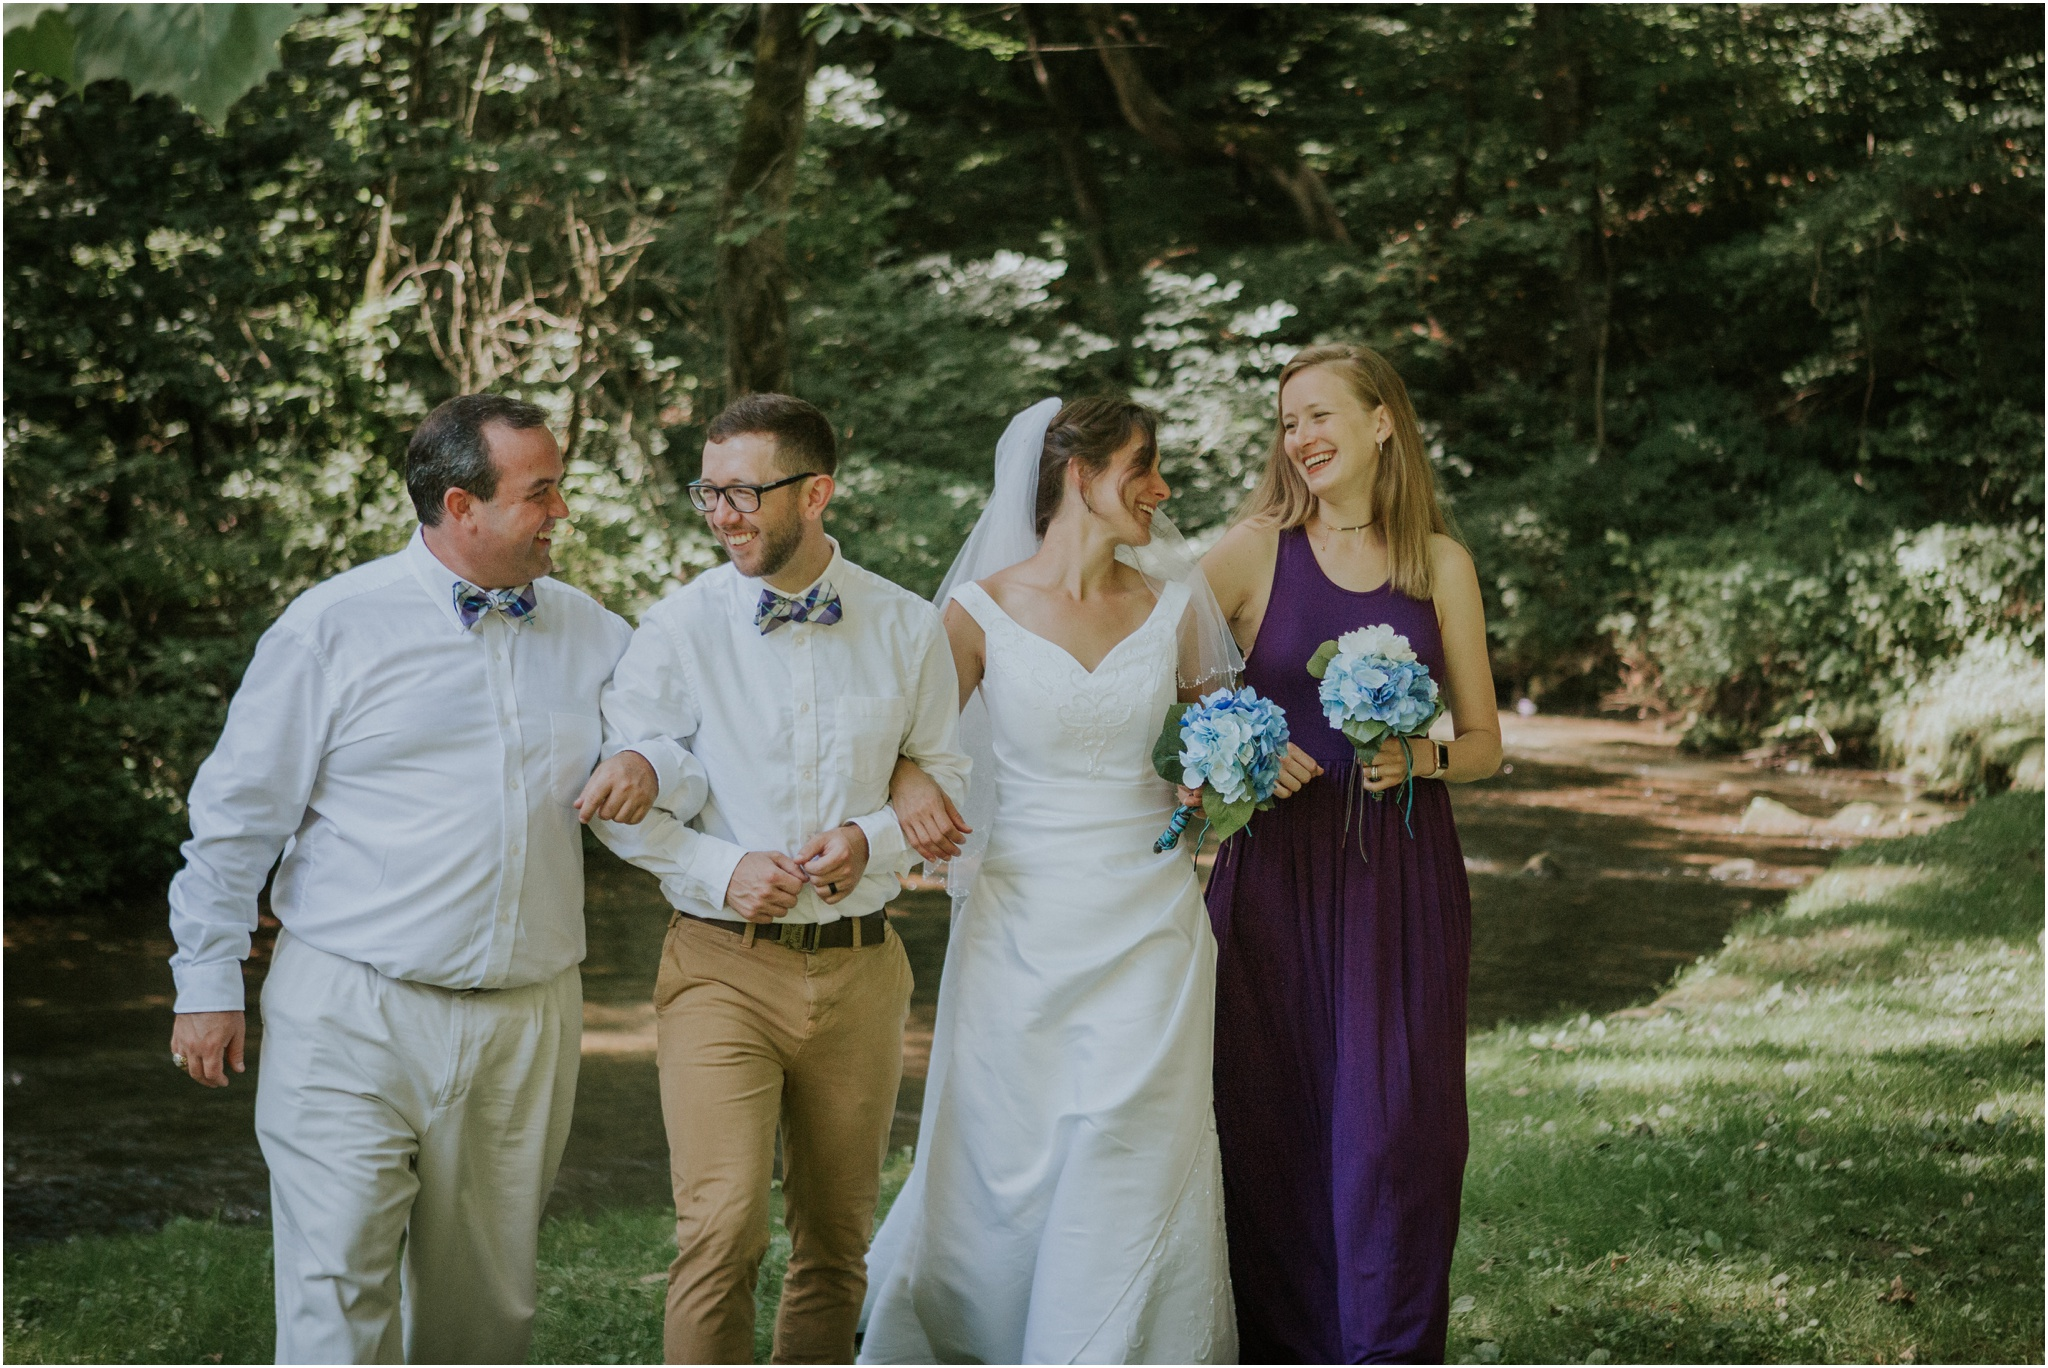 sugar-hollow-park-bristol-virginia-wedding-intimate-woodsy-black-forest-ceremony-adventurous-couple_0038.jpg